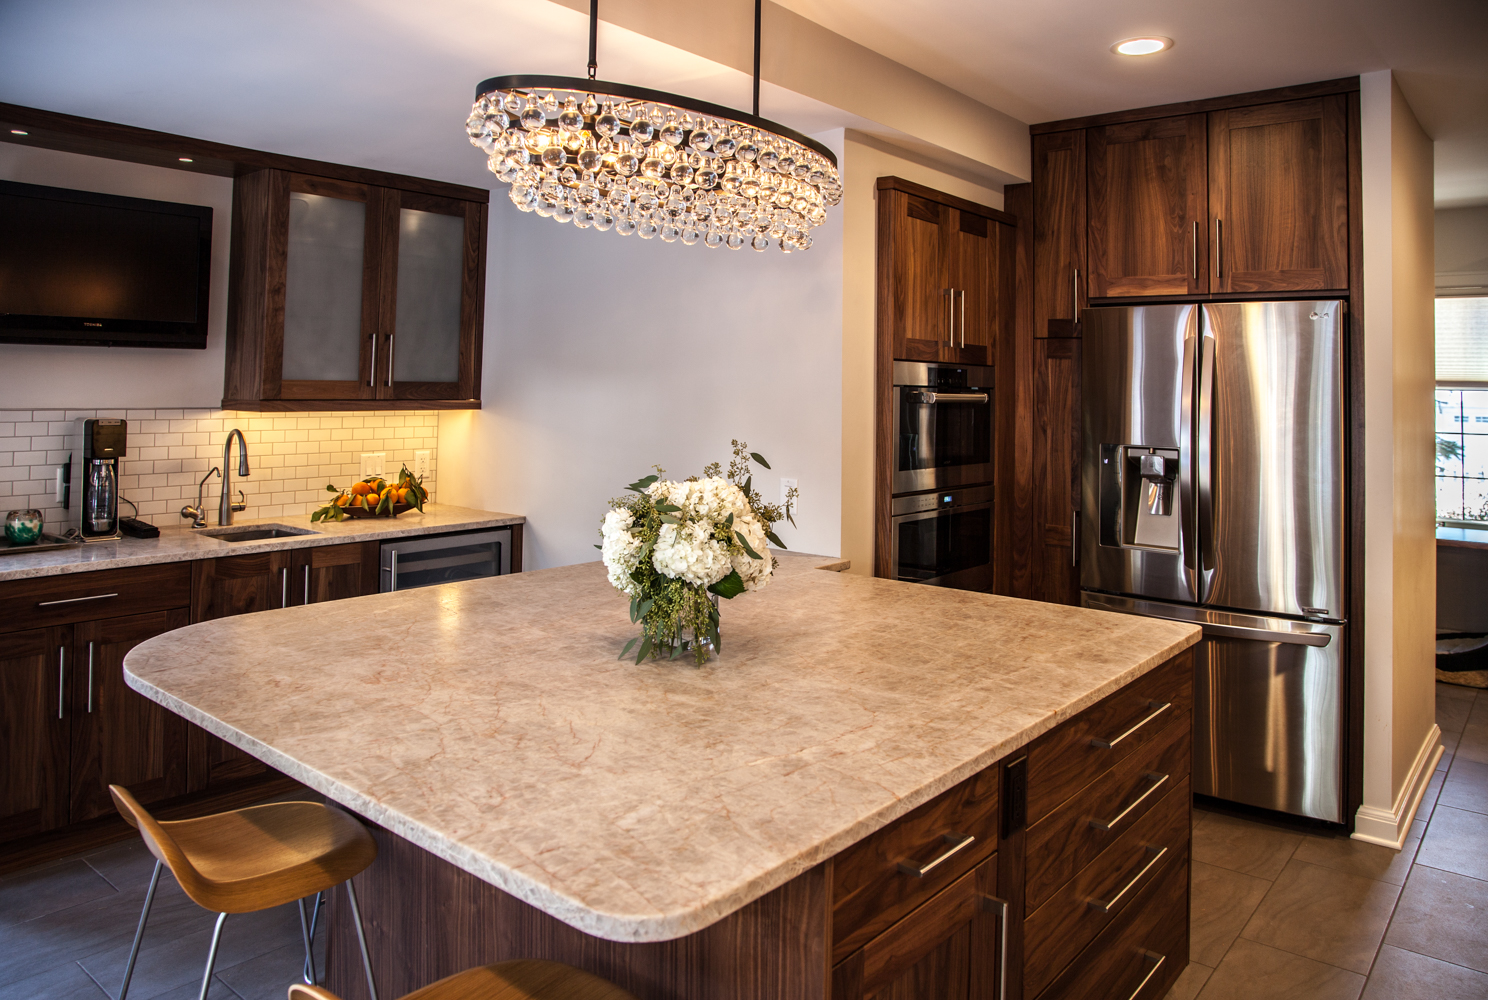 Dream Kitchen Delafield Barginer Wide Range Of